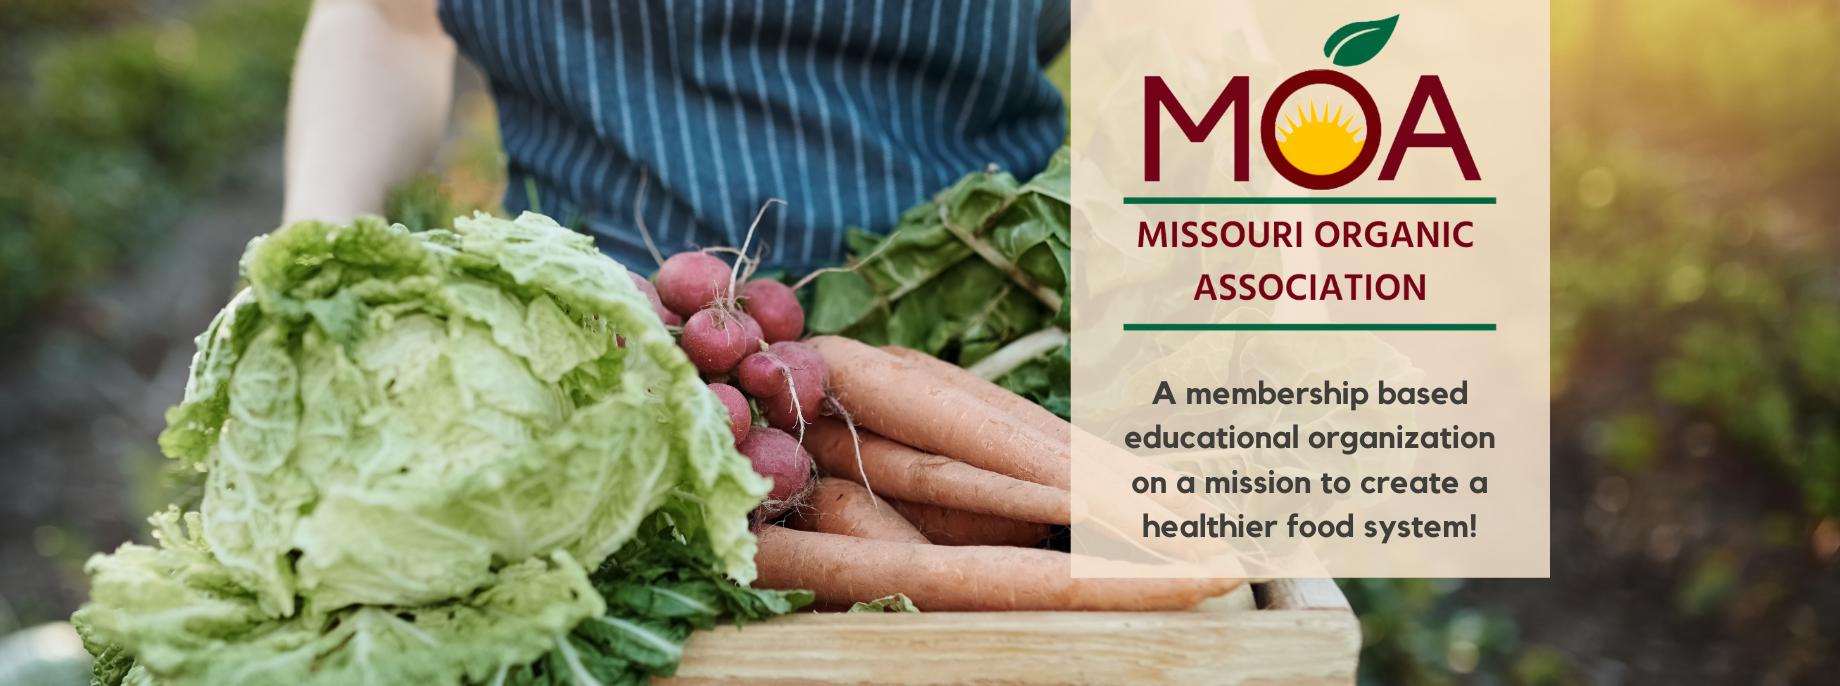 Missouri Organic Association - Sustainable Farming Banner